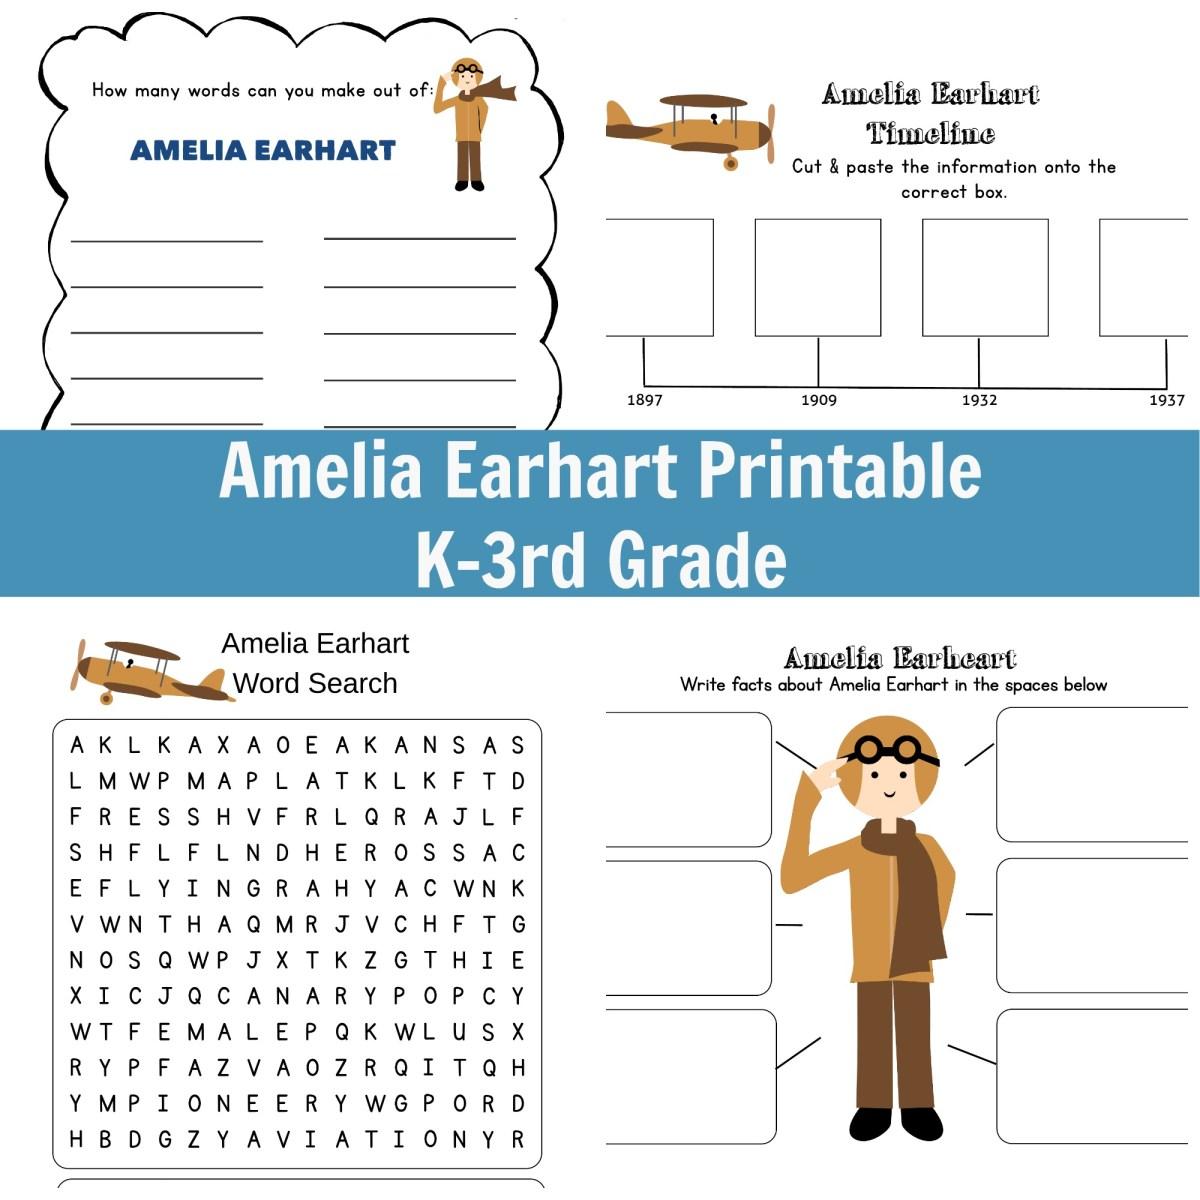 Amelia Earhart Printable - Grades K-3